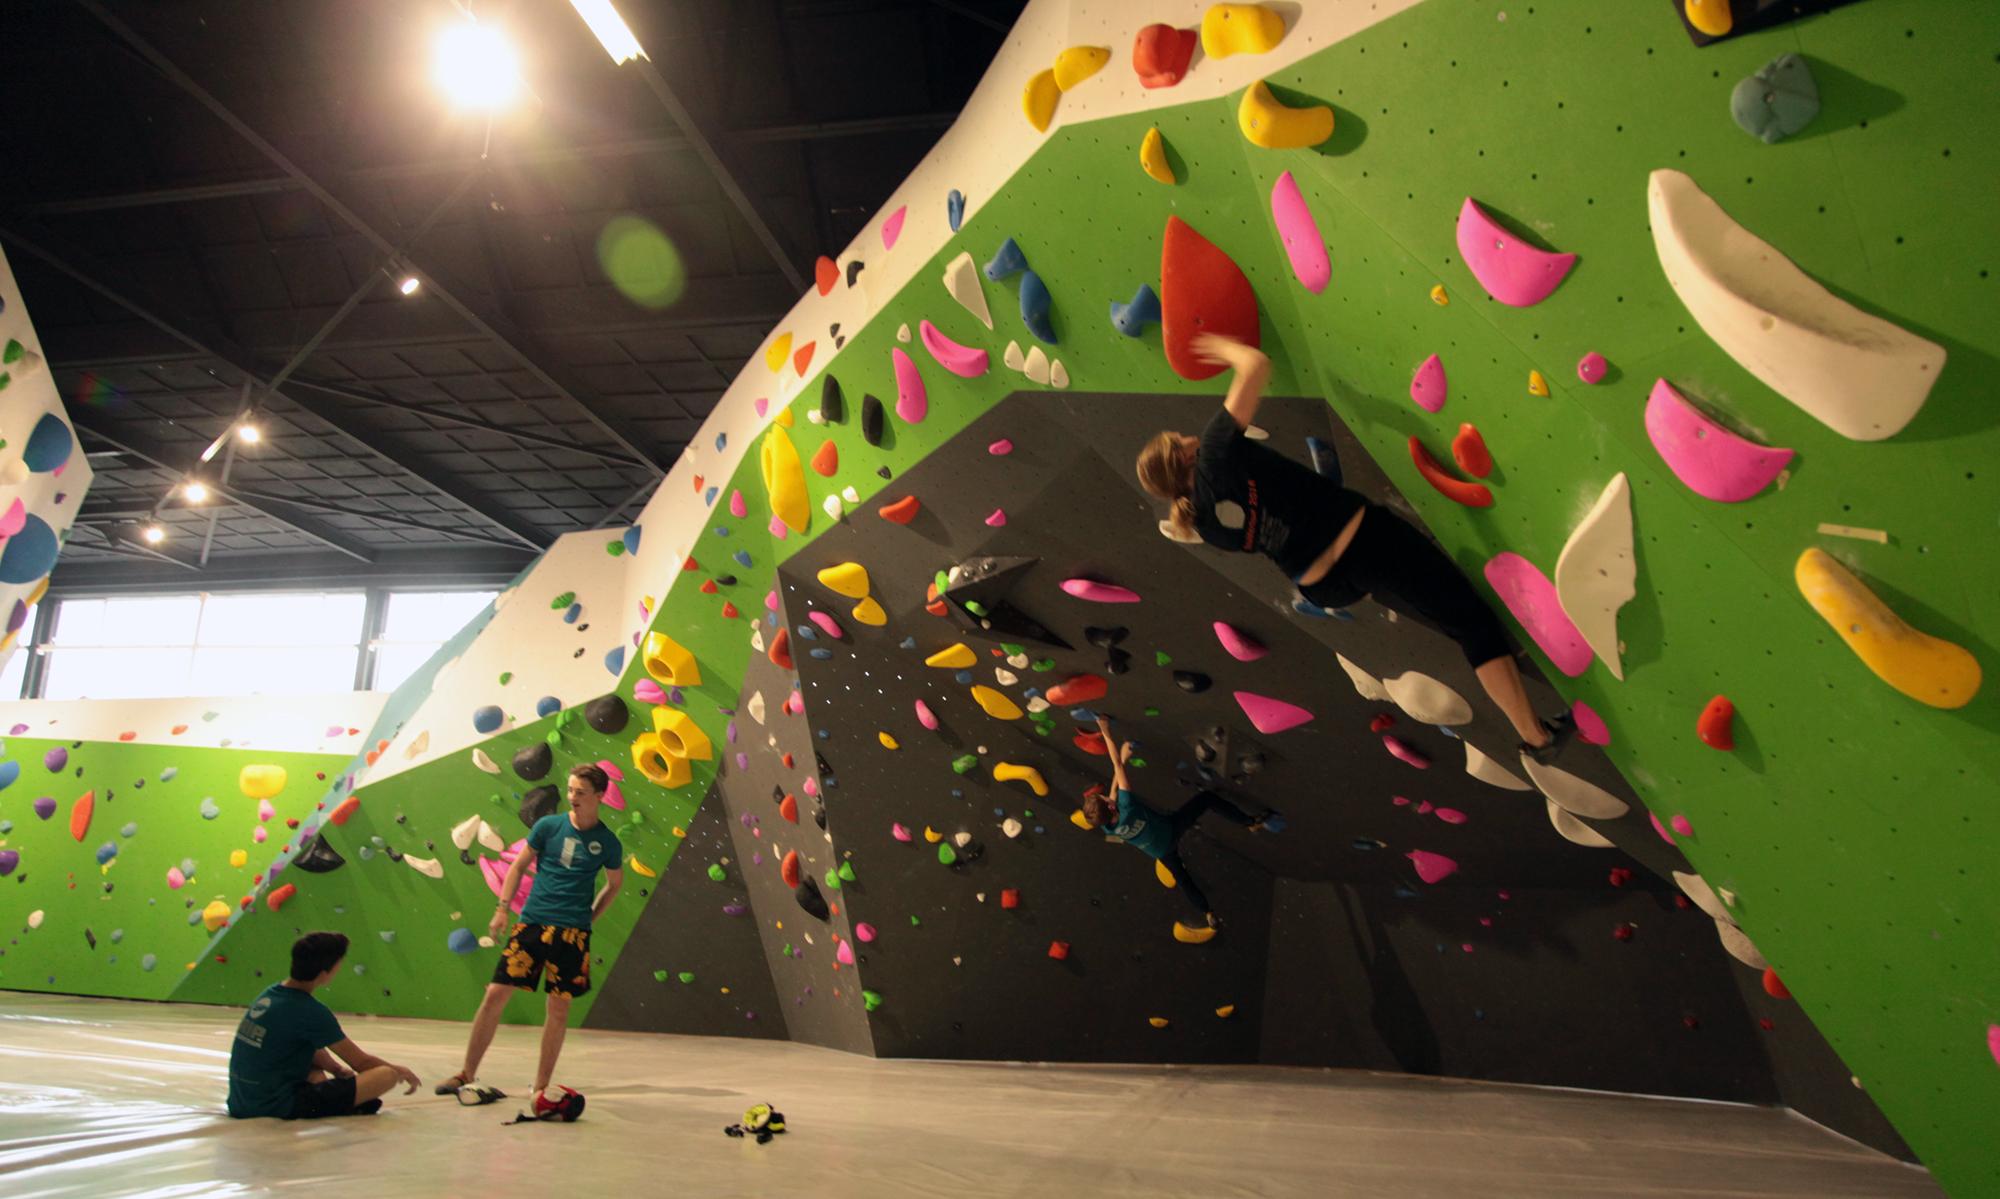 Een sfeershot van de nieuwe boulderhal die dit weekend geopend is.